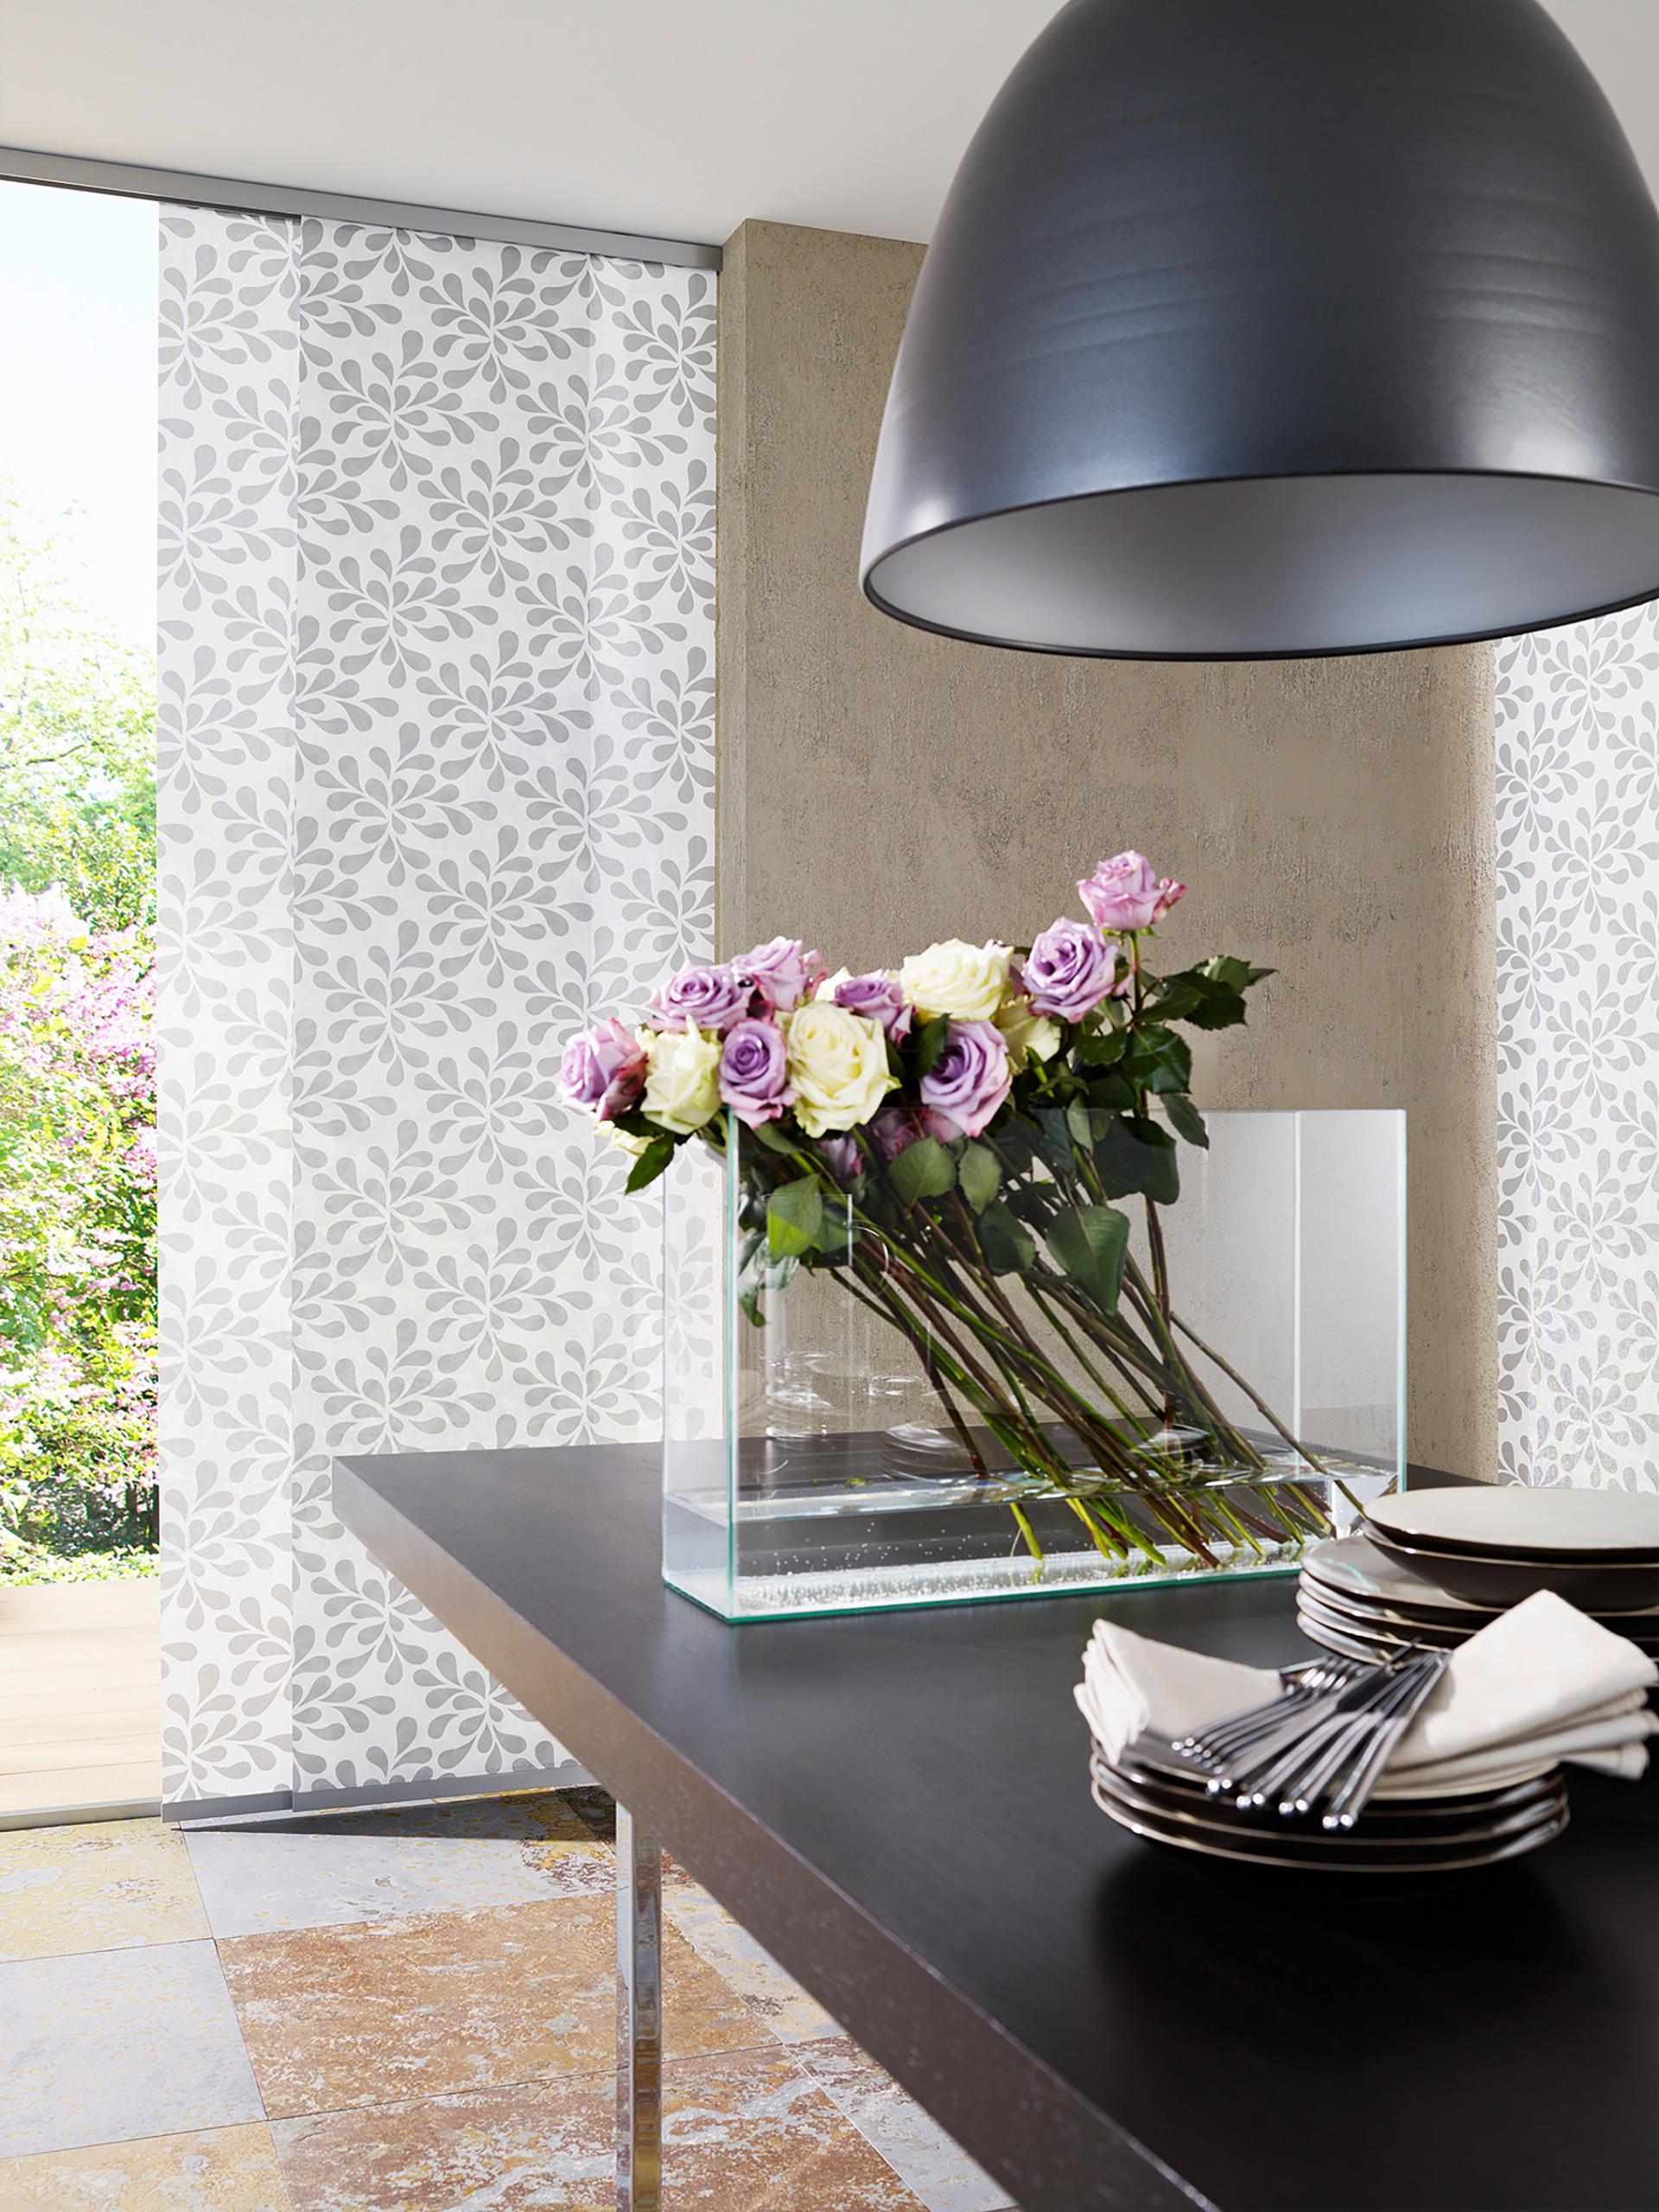 fl chenvorhang heu fl chenvorhangsysteme von leha architonic. Black Bedroom Furniture Sets. Home Design Ideas